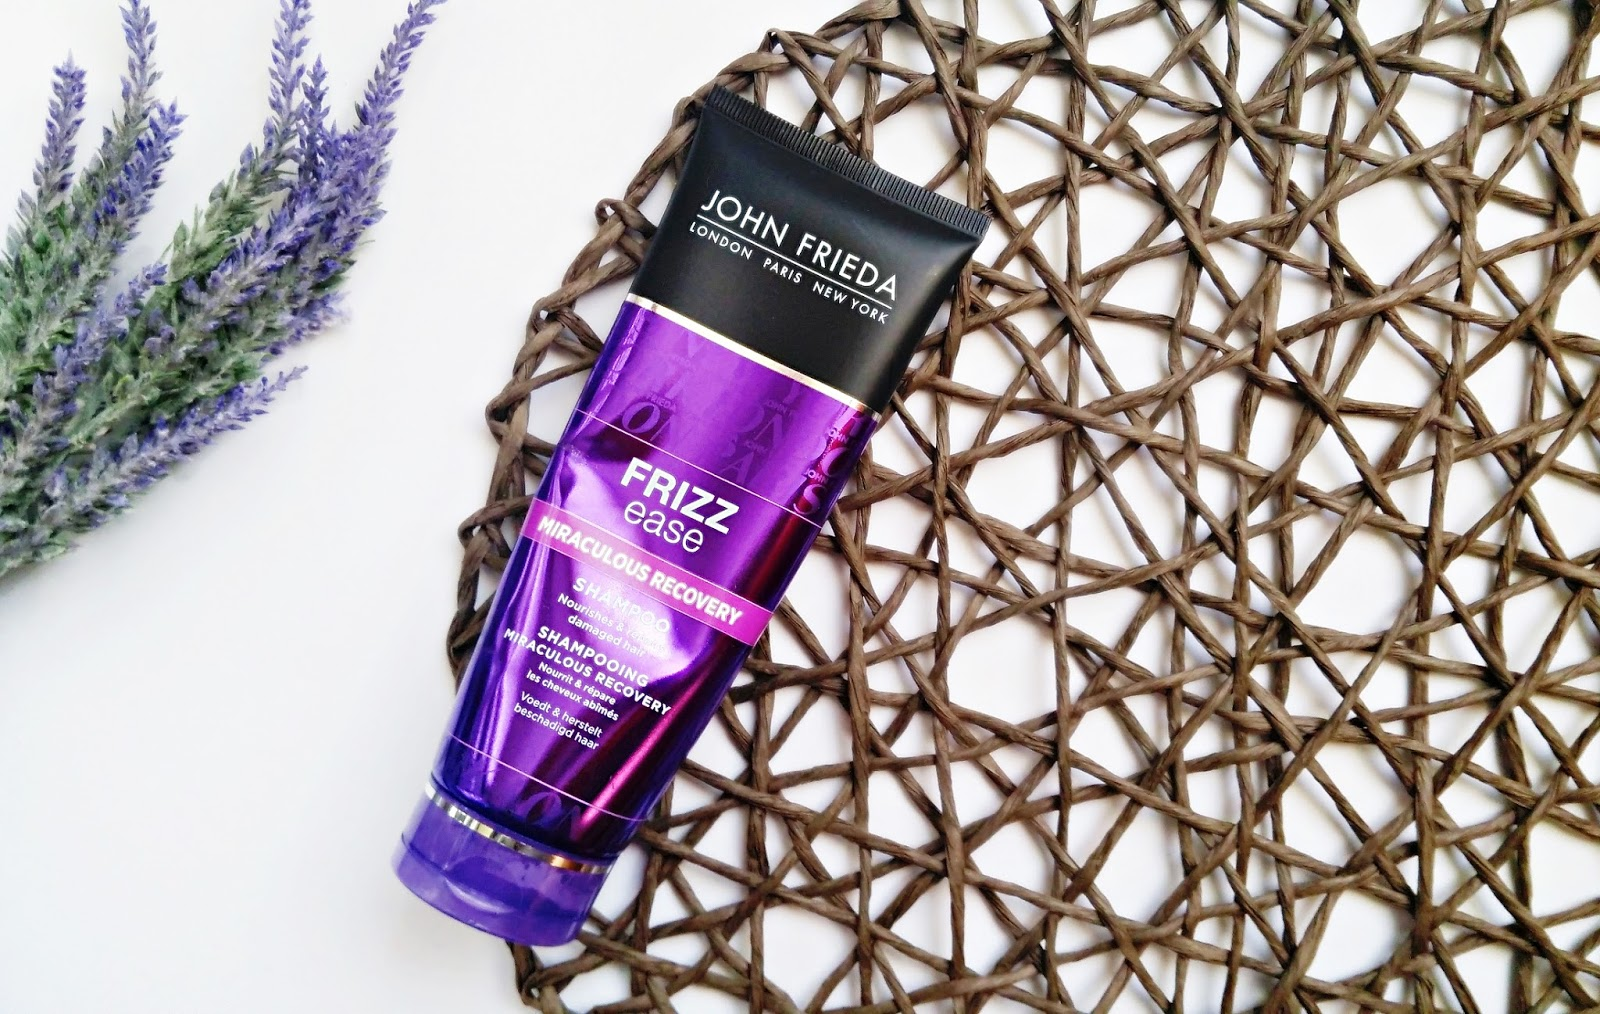 szampon John Frieda Frizz Ease Miraculous Recovery